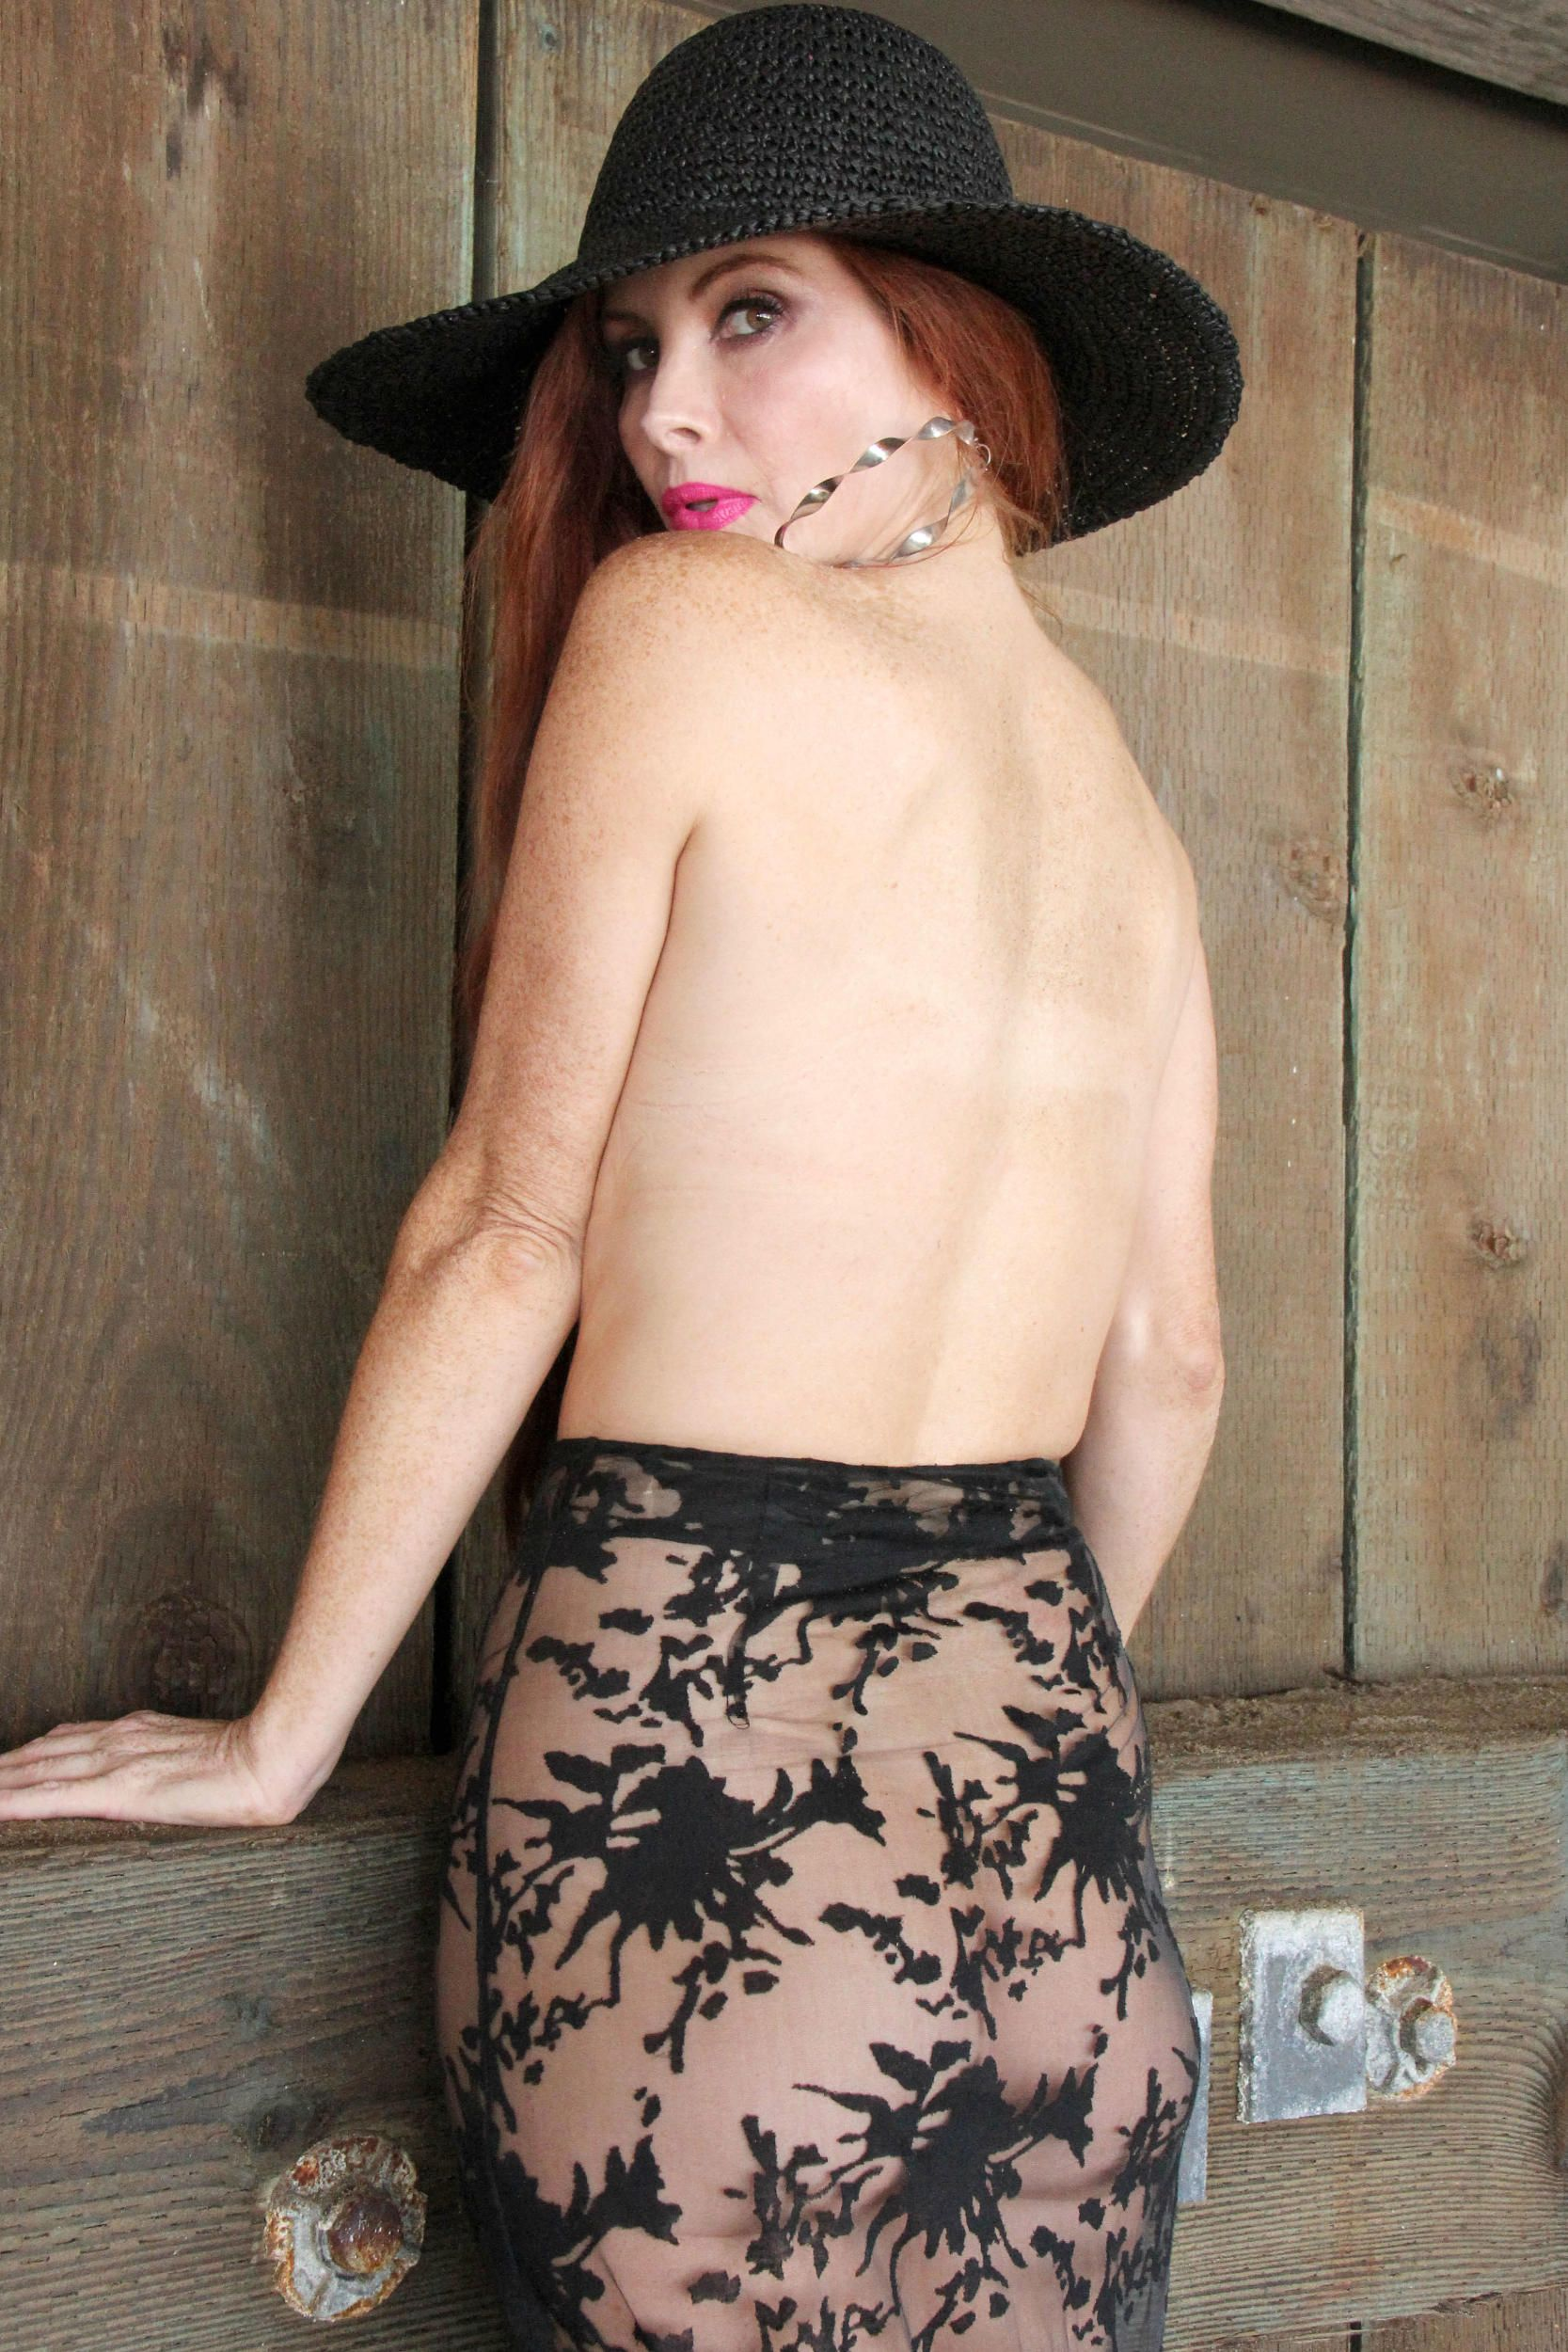 Phoebe-Price-Topless-8